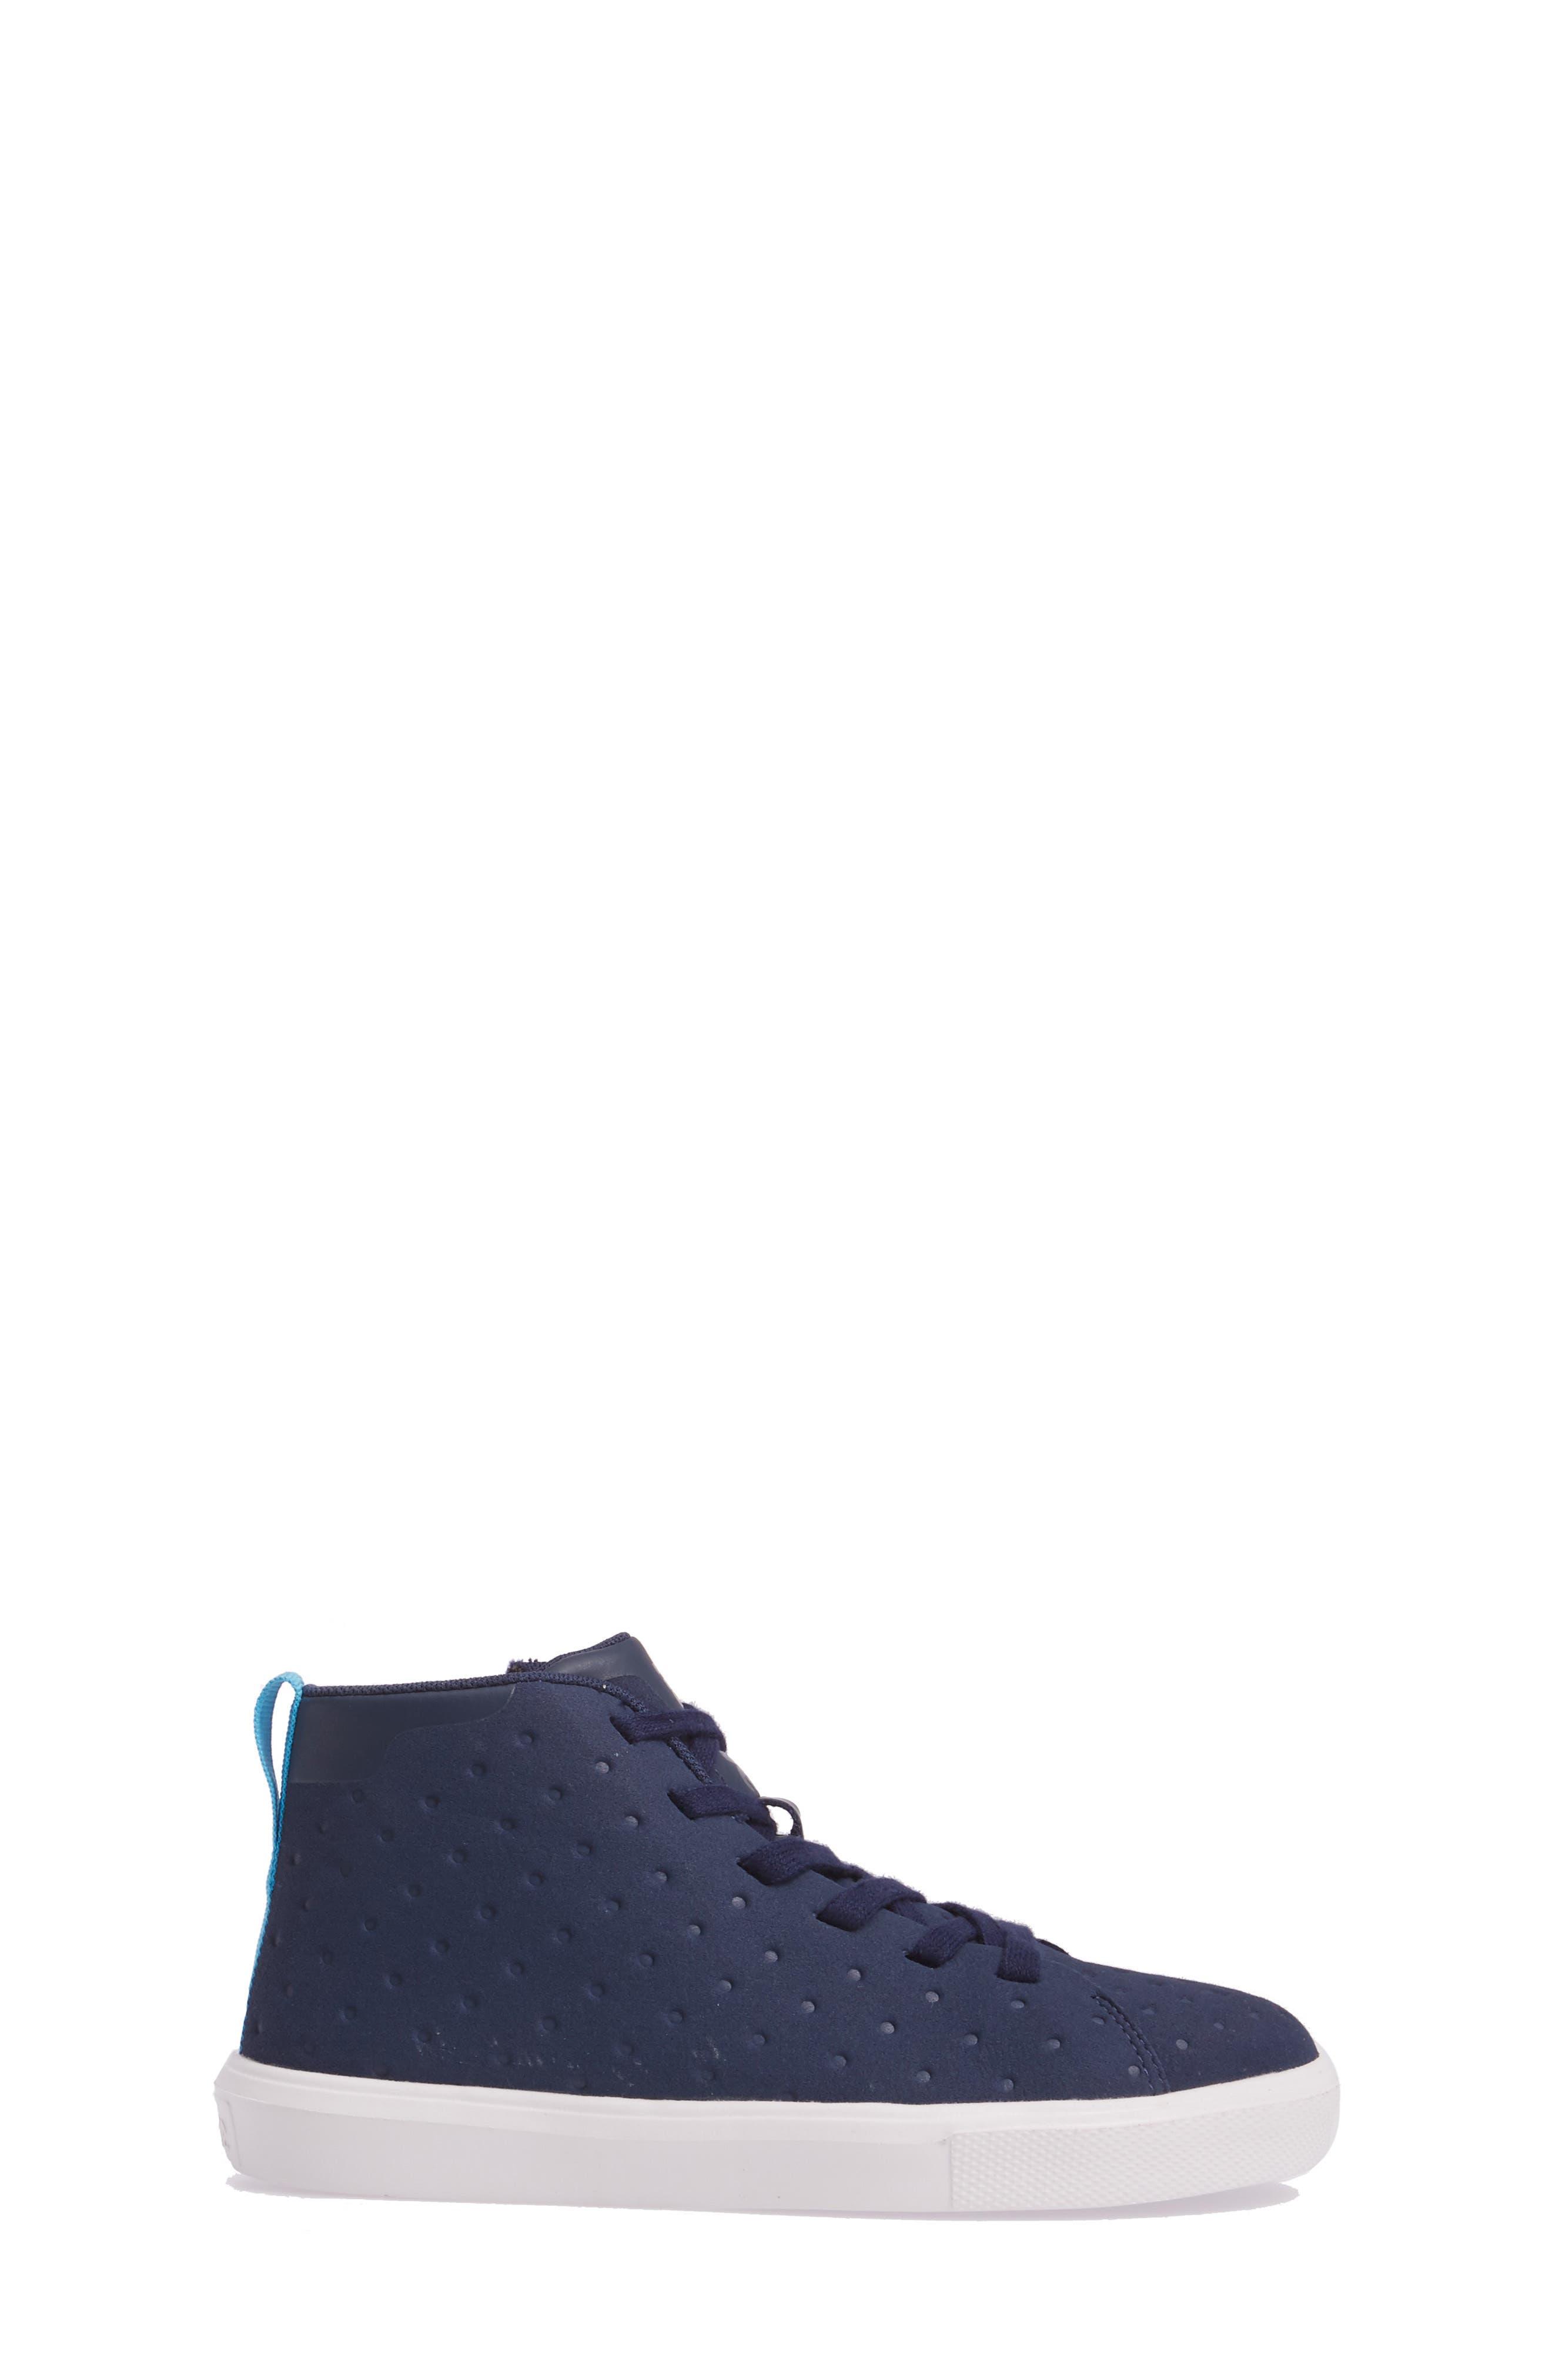 Native Monaco Sneaker,                             Alternate thumbnail 3, color,                             Regatta Blue/ Shell White